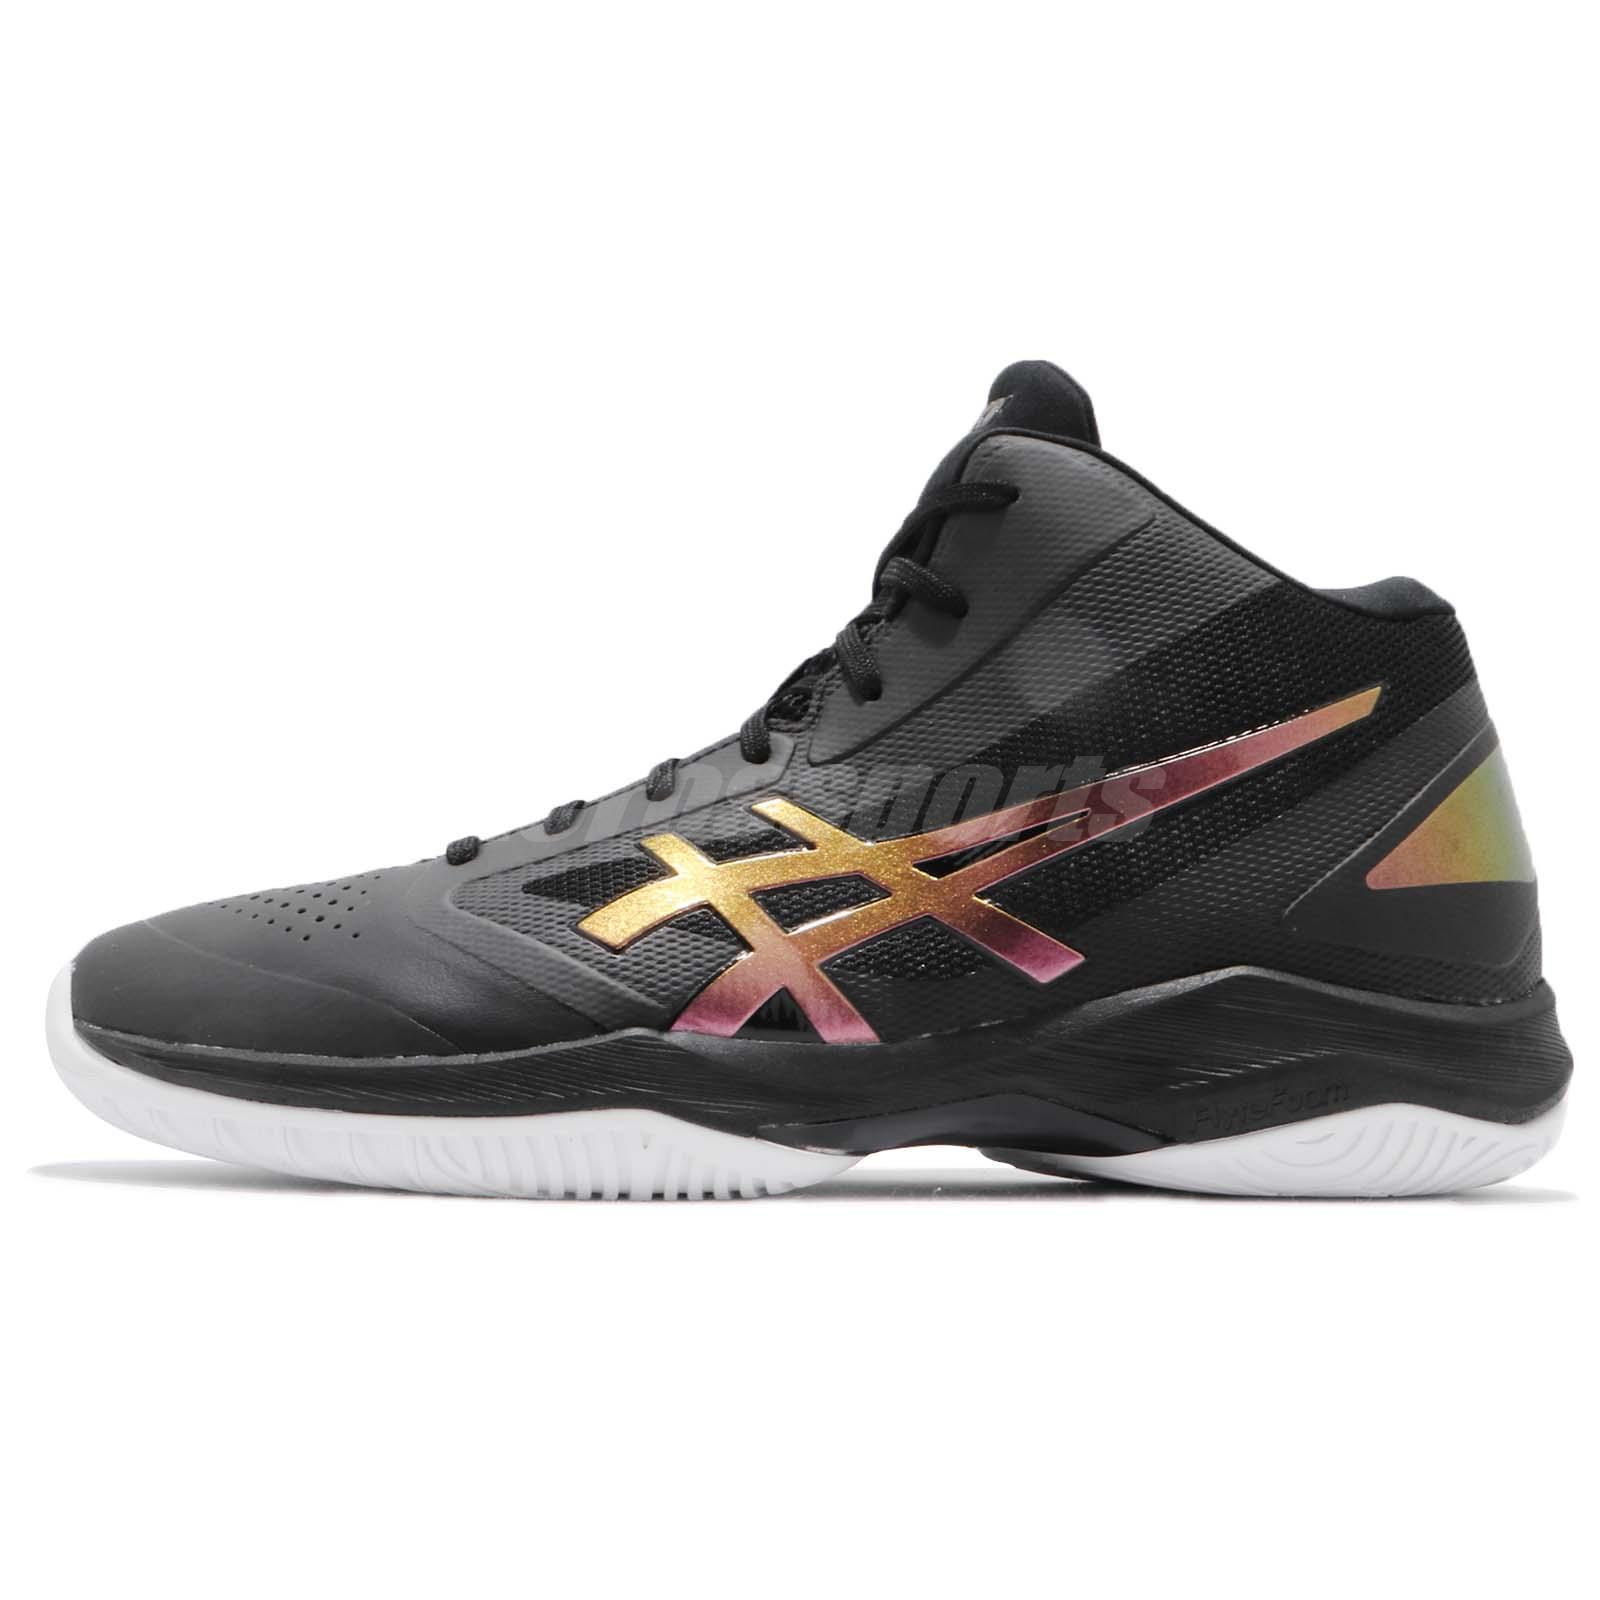 c08beecc898e Asics Gel-Hoop V 10 Wide Black Prism Fire Red Men Basketball Shoes  TBF340-9026